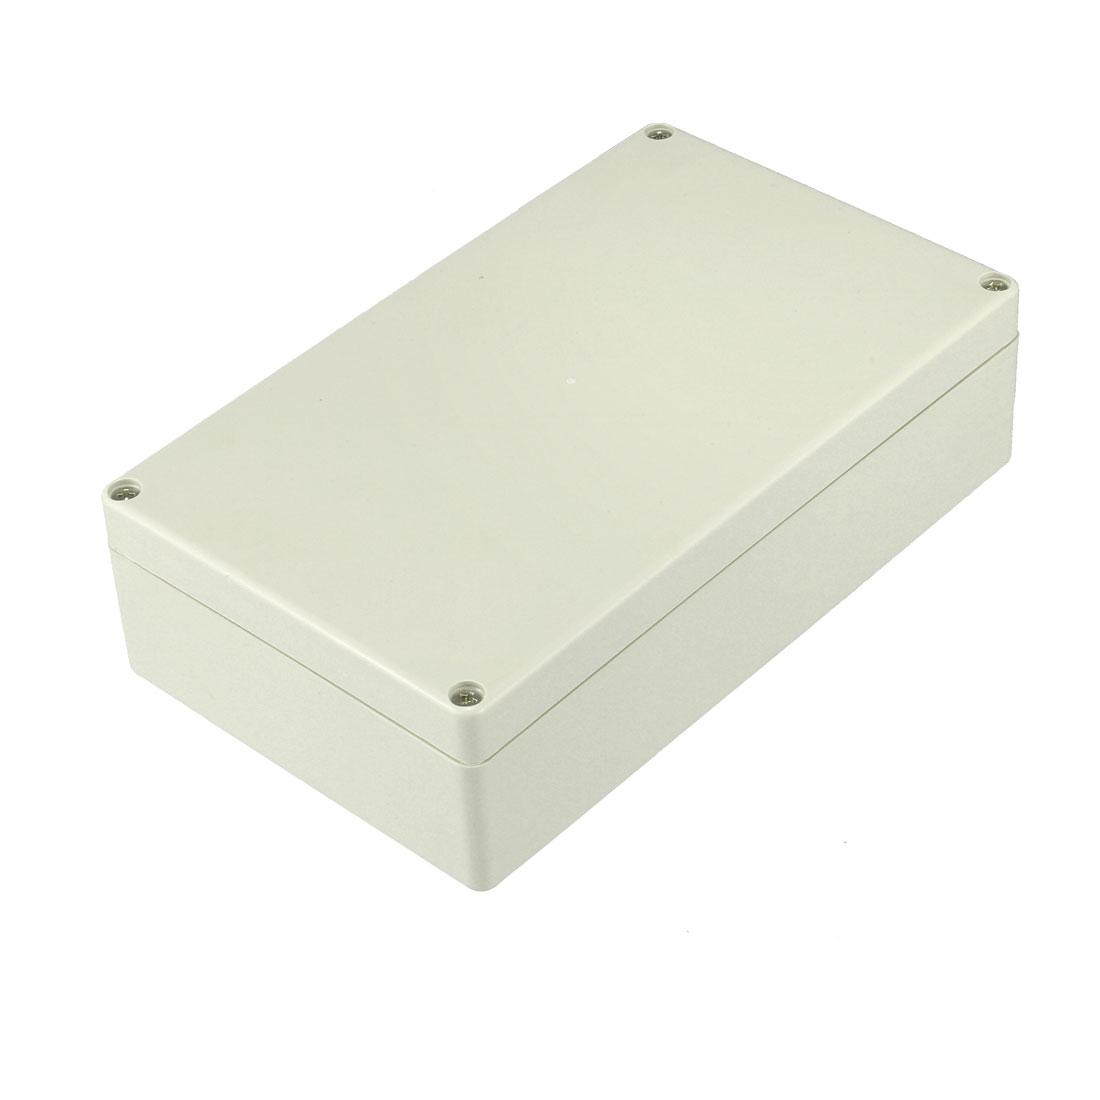 200 x 120 x 56mm Electronic ABS Plastic DIY Junction Box Enclosure Case Beige